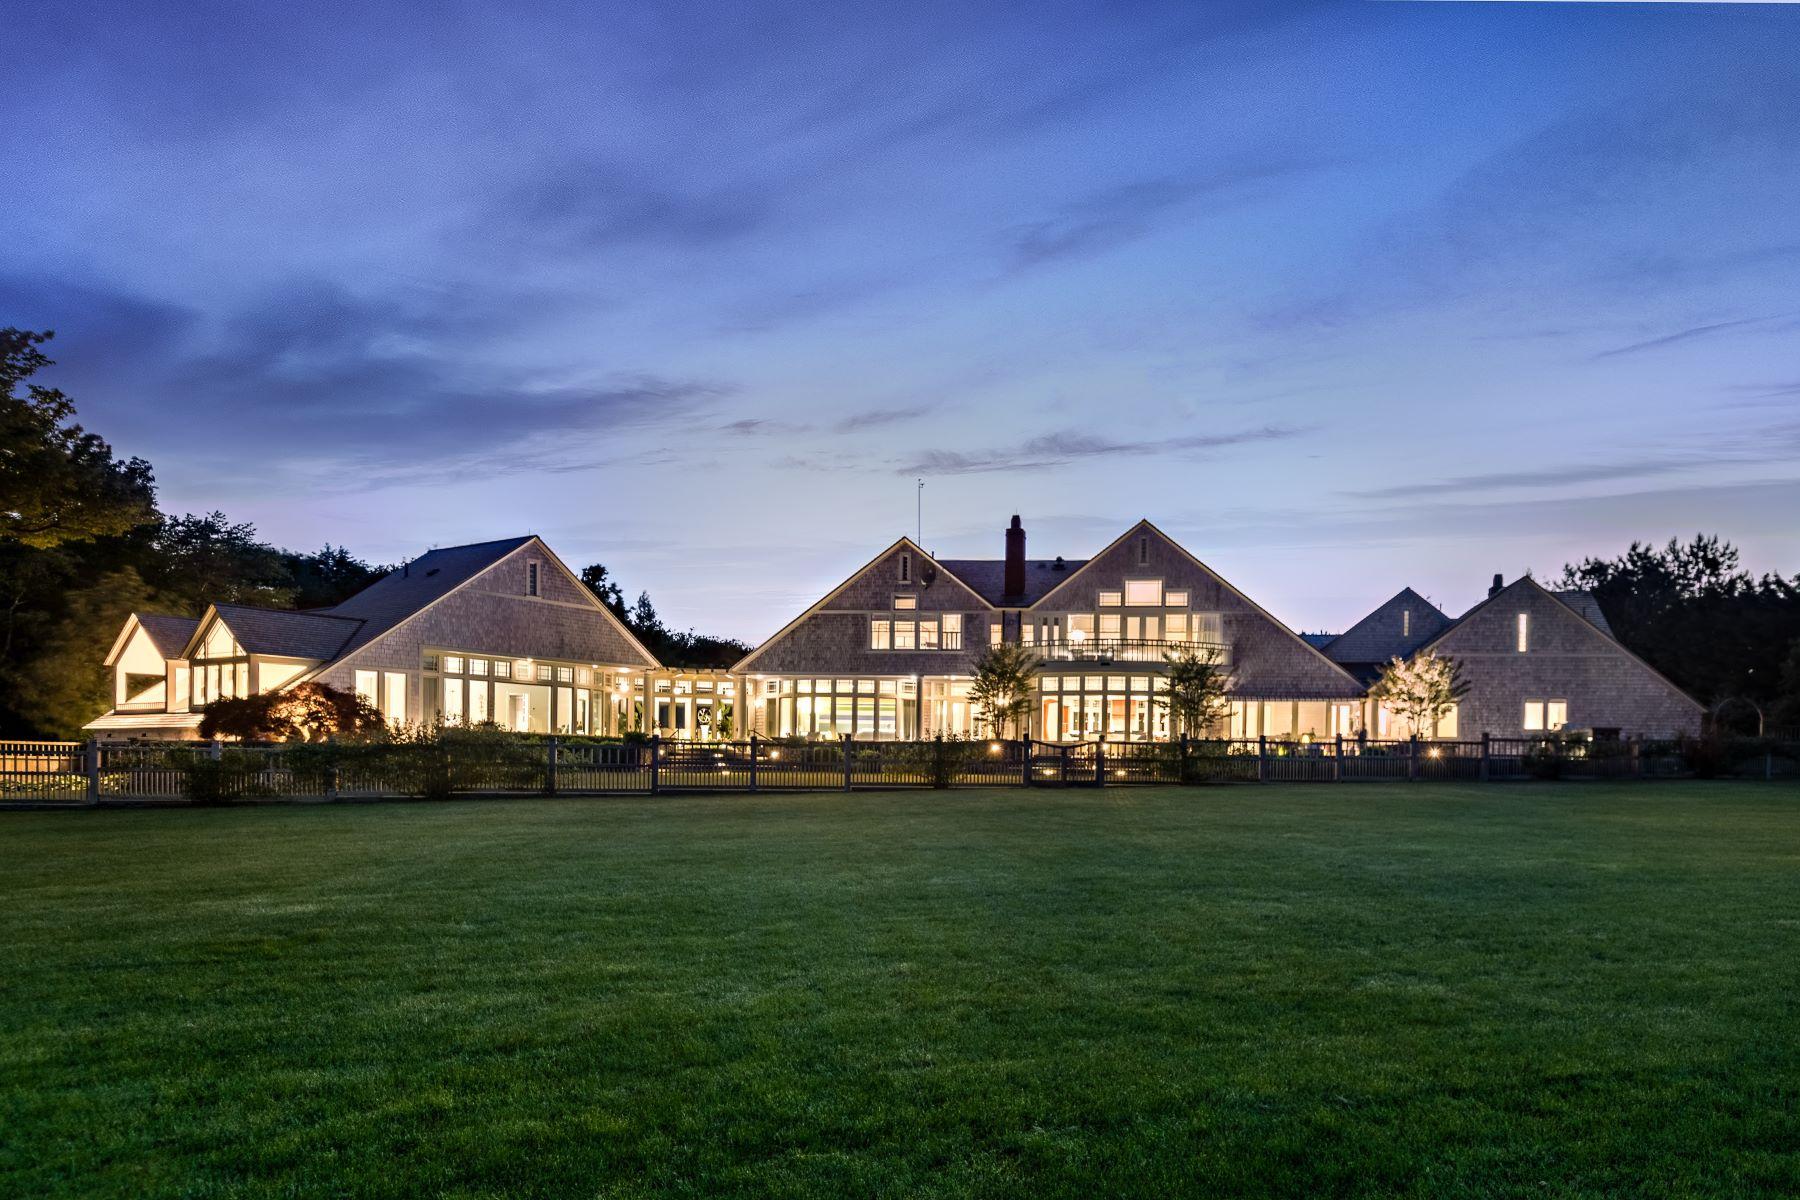 single family homes for Sale at 609 Beavertail Rd, Jamestown, RI Jamestown, Rhode Island 02835 United States